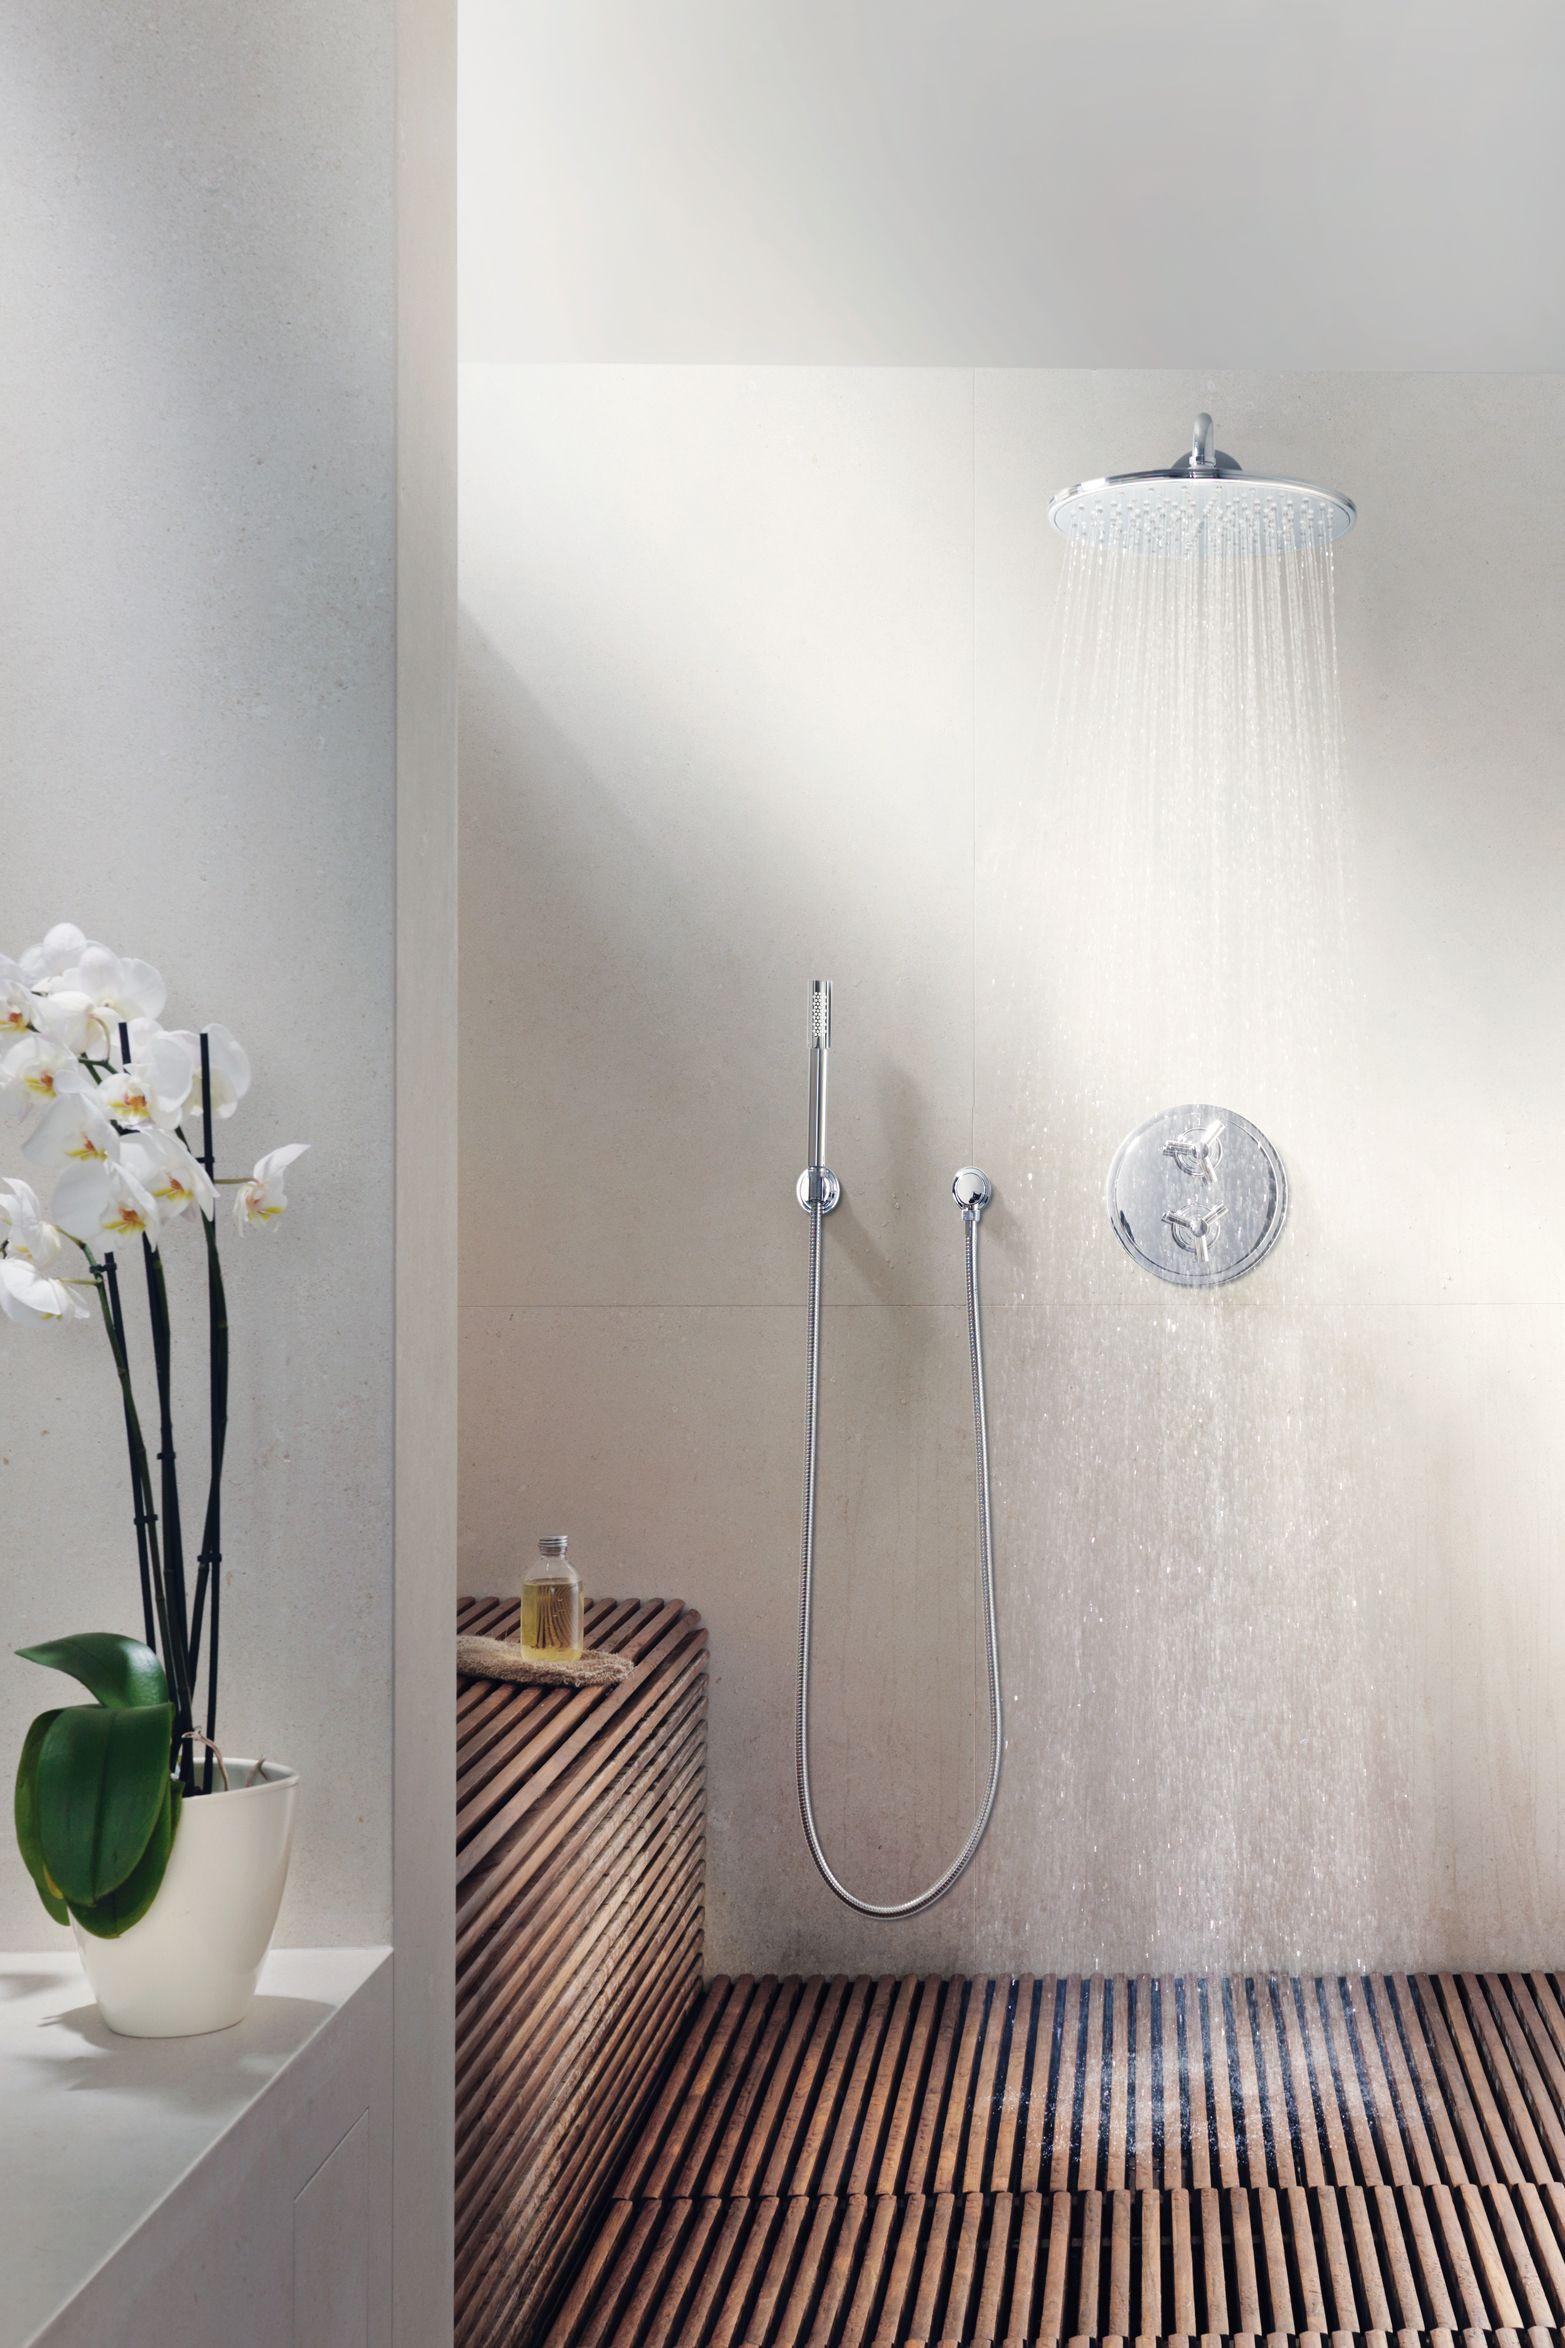 best 15 amazing bathroom shower ideas bathroom shower ideas rh pinterest com bathroom shower tile ideas on a budget Small Bathroom Ideas On a Budget